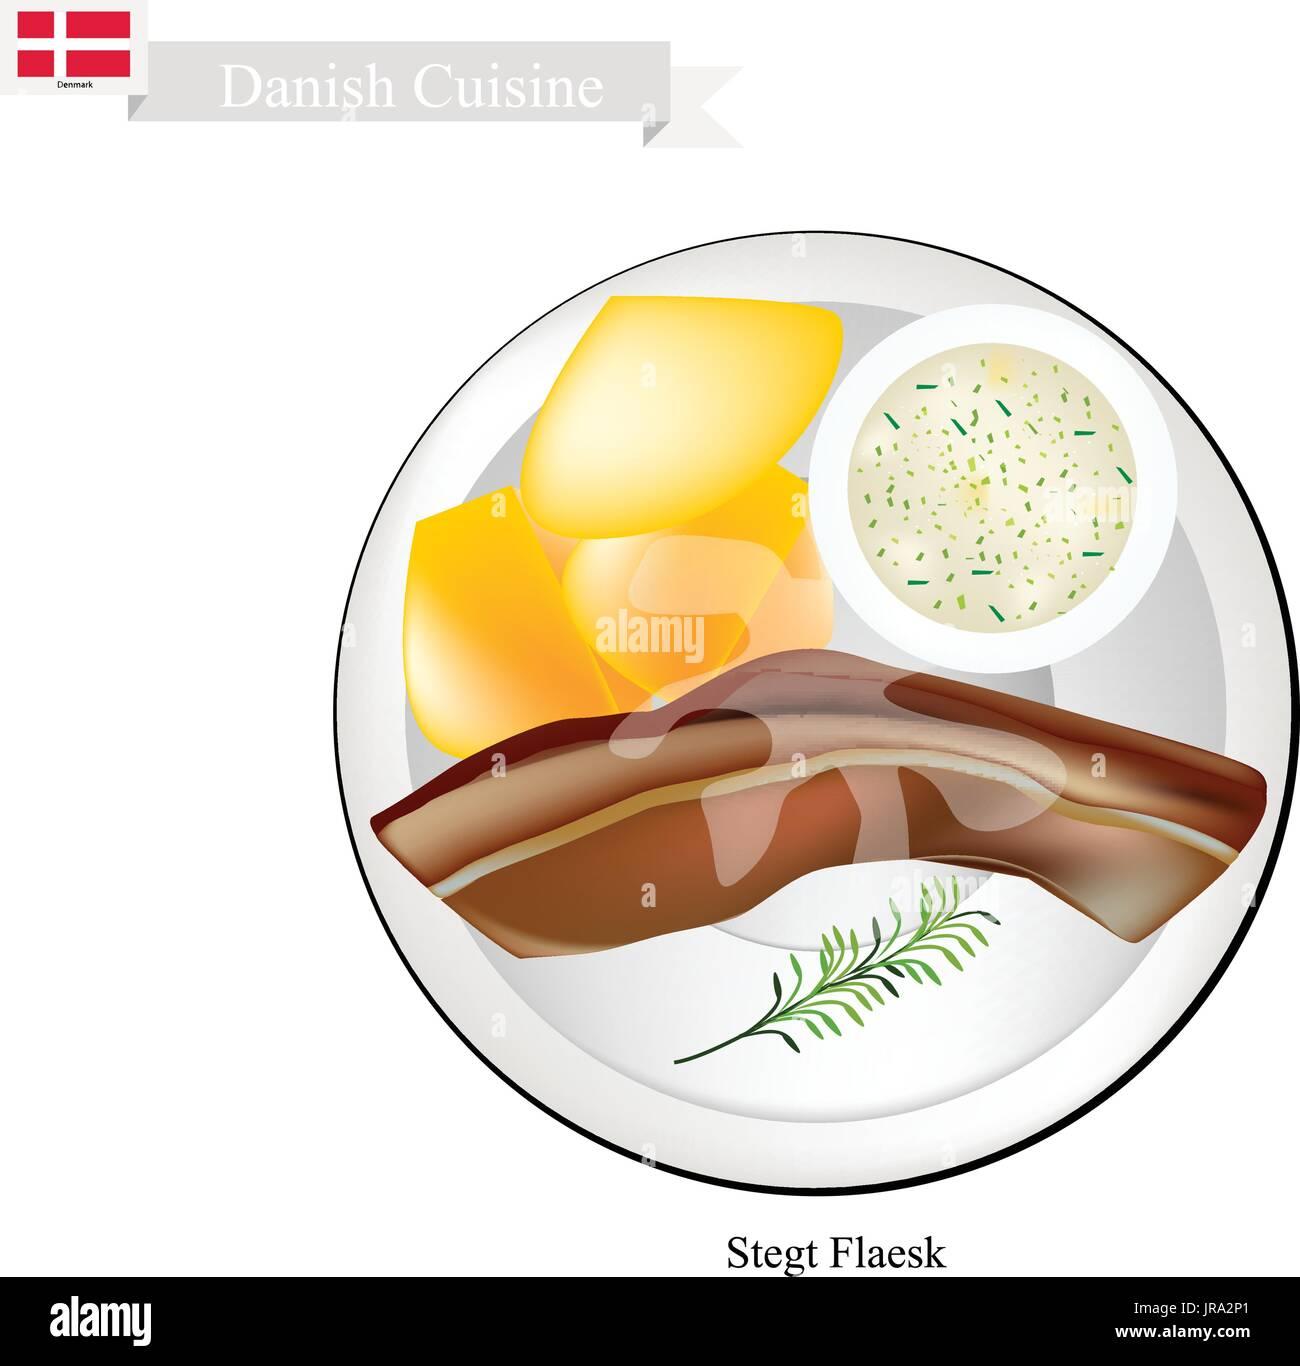 danish cuisine illustration of stegt flaesk or traditional fried pork JRA2P1 pork belly stock vector images alamy